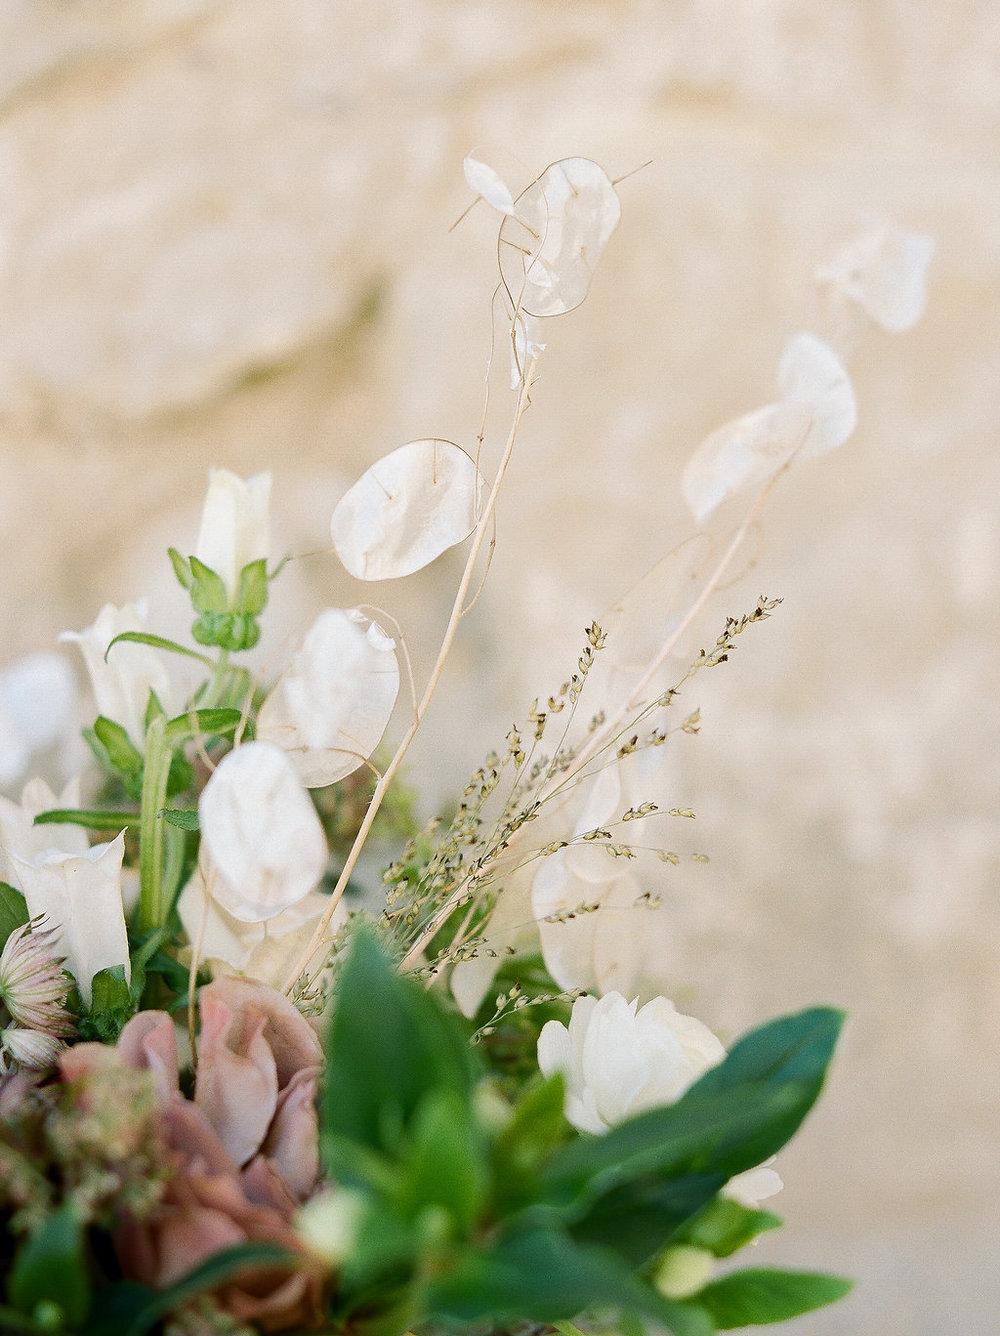 Spanish Mission Style Wedding Ideas Summer Flowers Finding Flora San Juan Capistrano European Venues California Centerpiece Lunaria